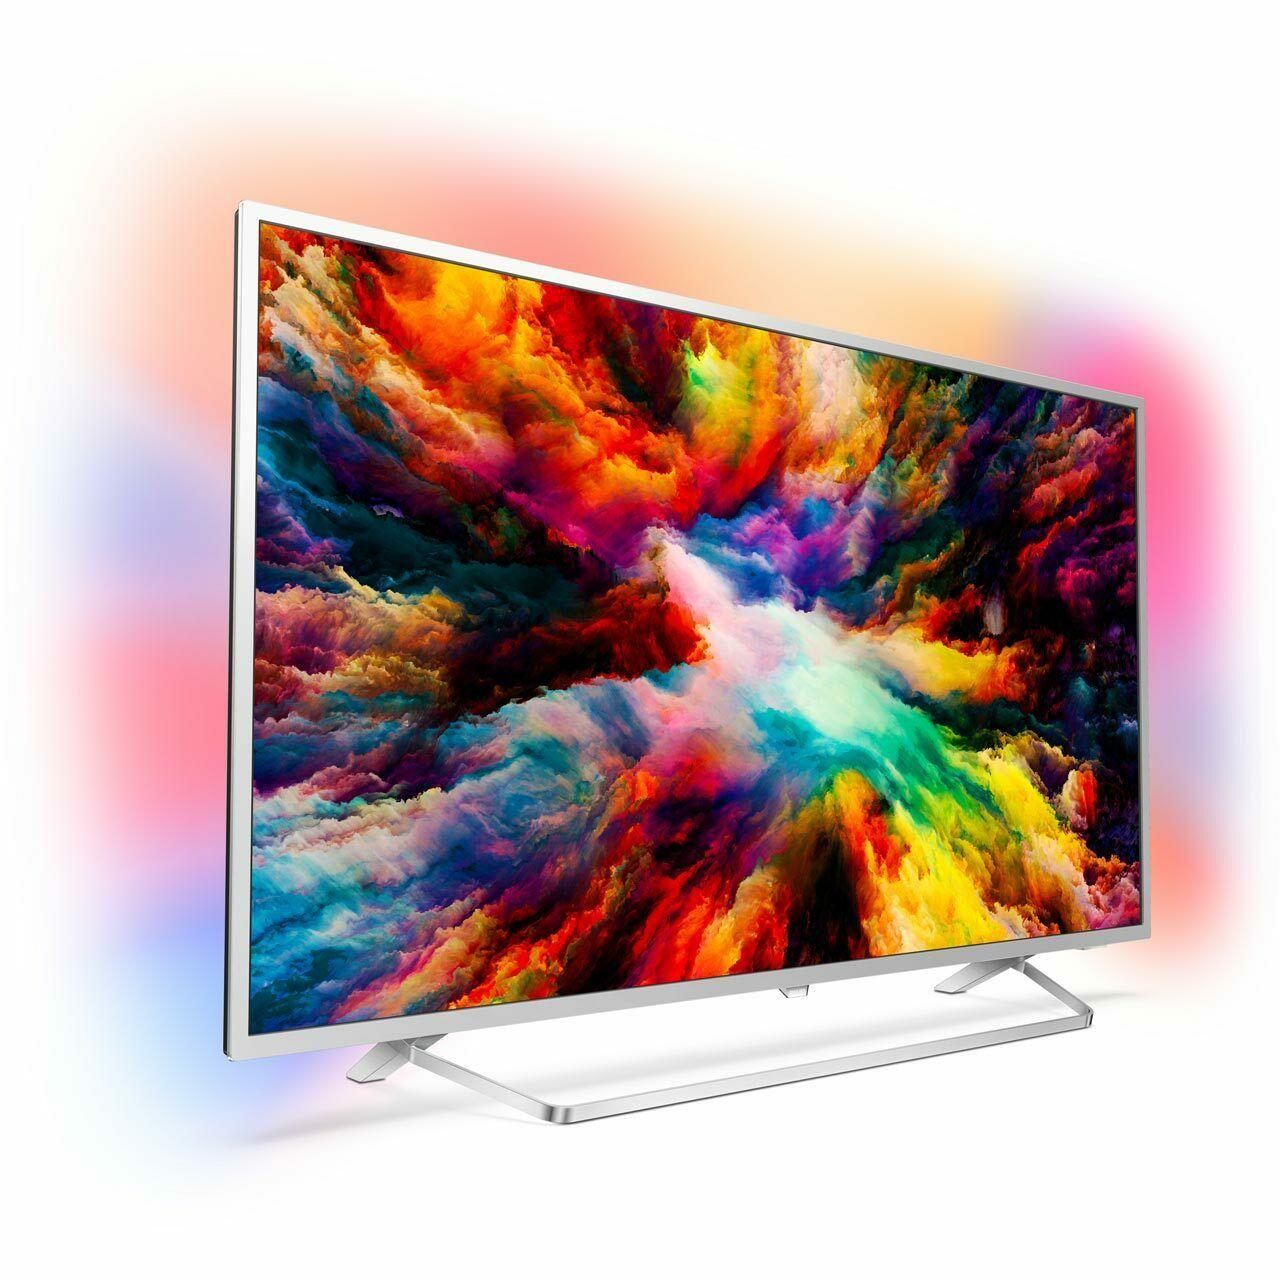 Philips Ambilight 55PUS7383/12 55'' 4K UHD LED TV 4 HDMI £454 / 43PUS7383/12 43'' £324 / 50PUS7383/12 50'' £374 with code @ AO Ebay